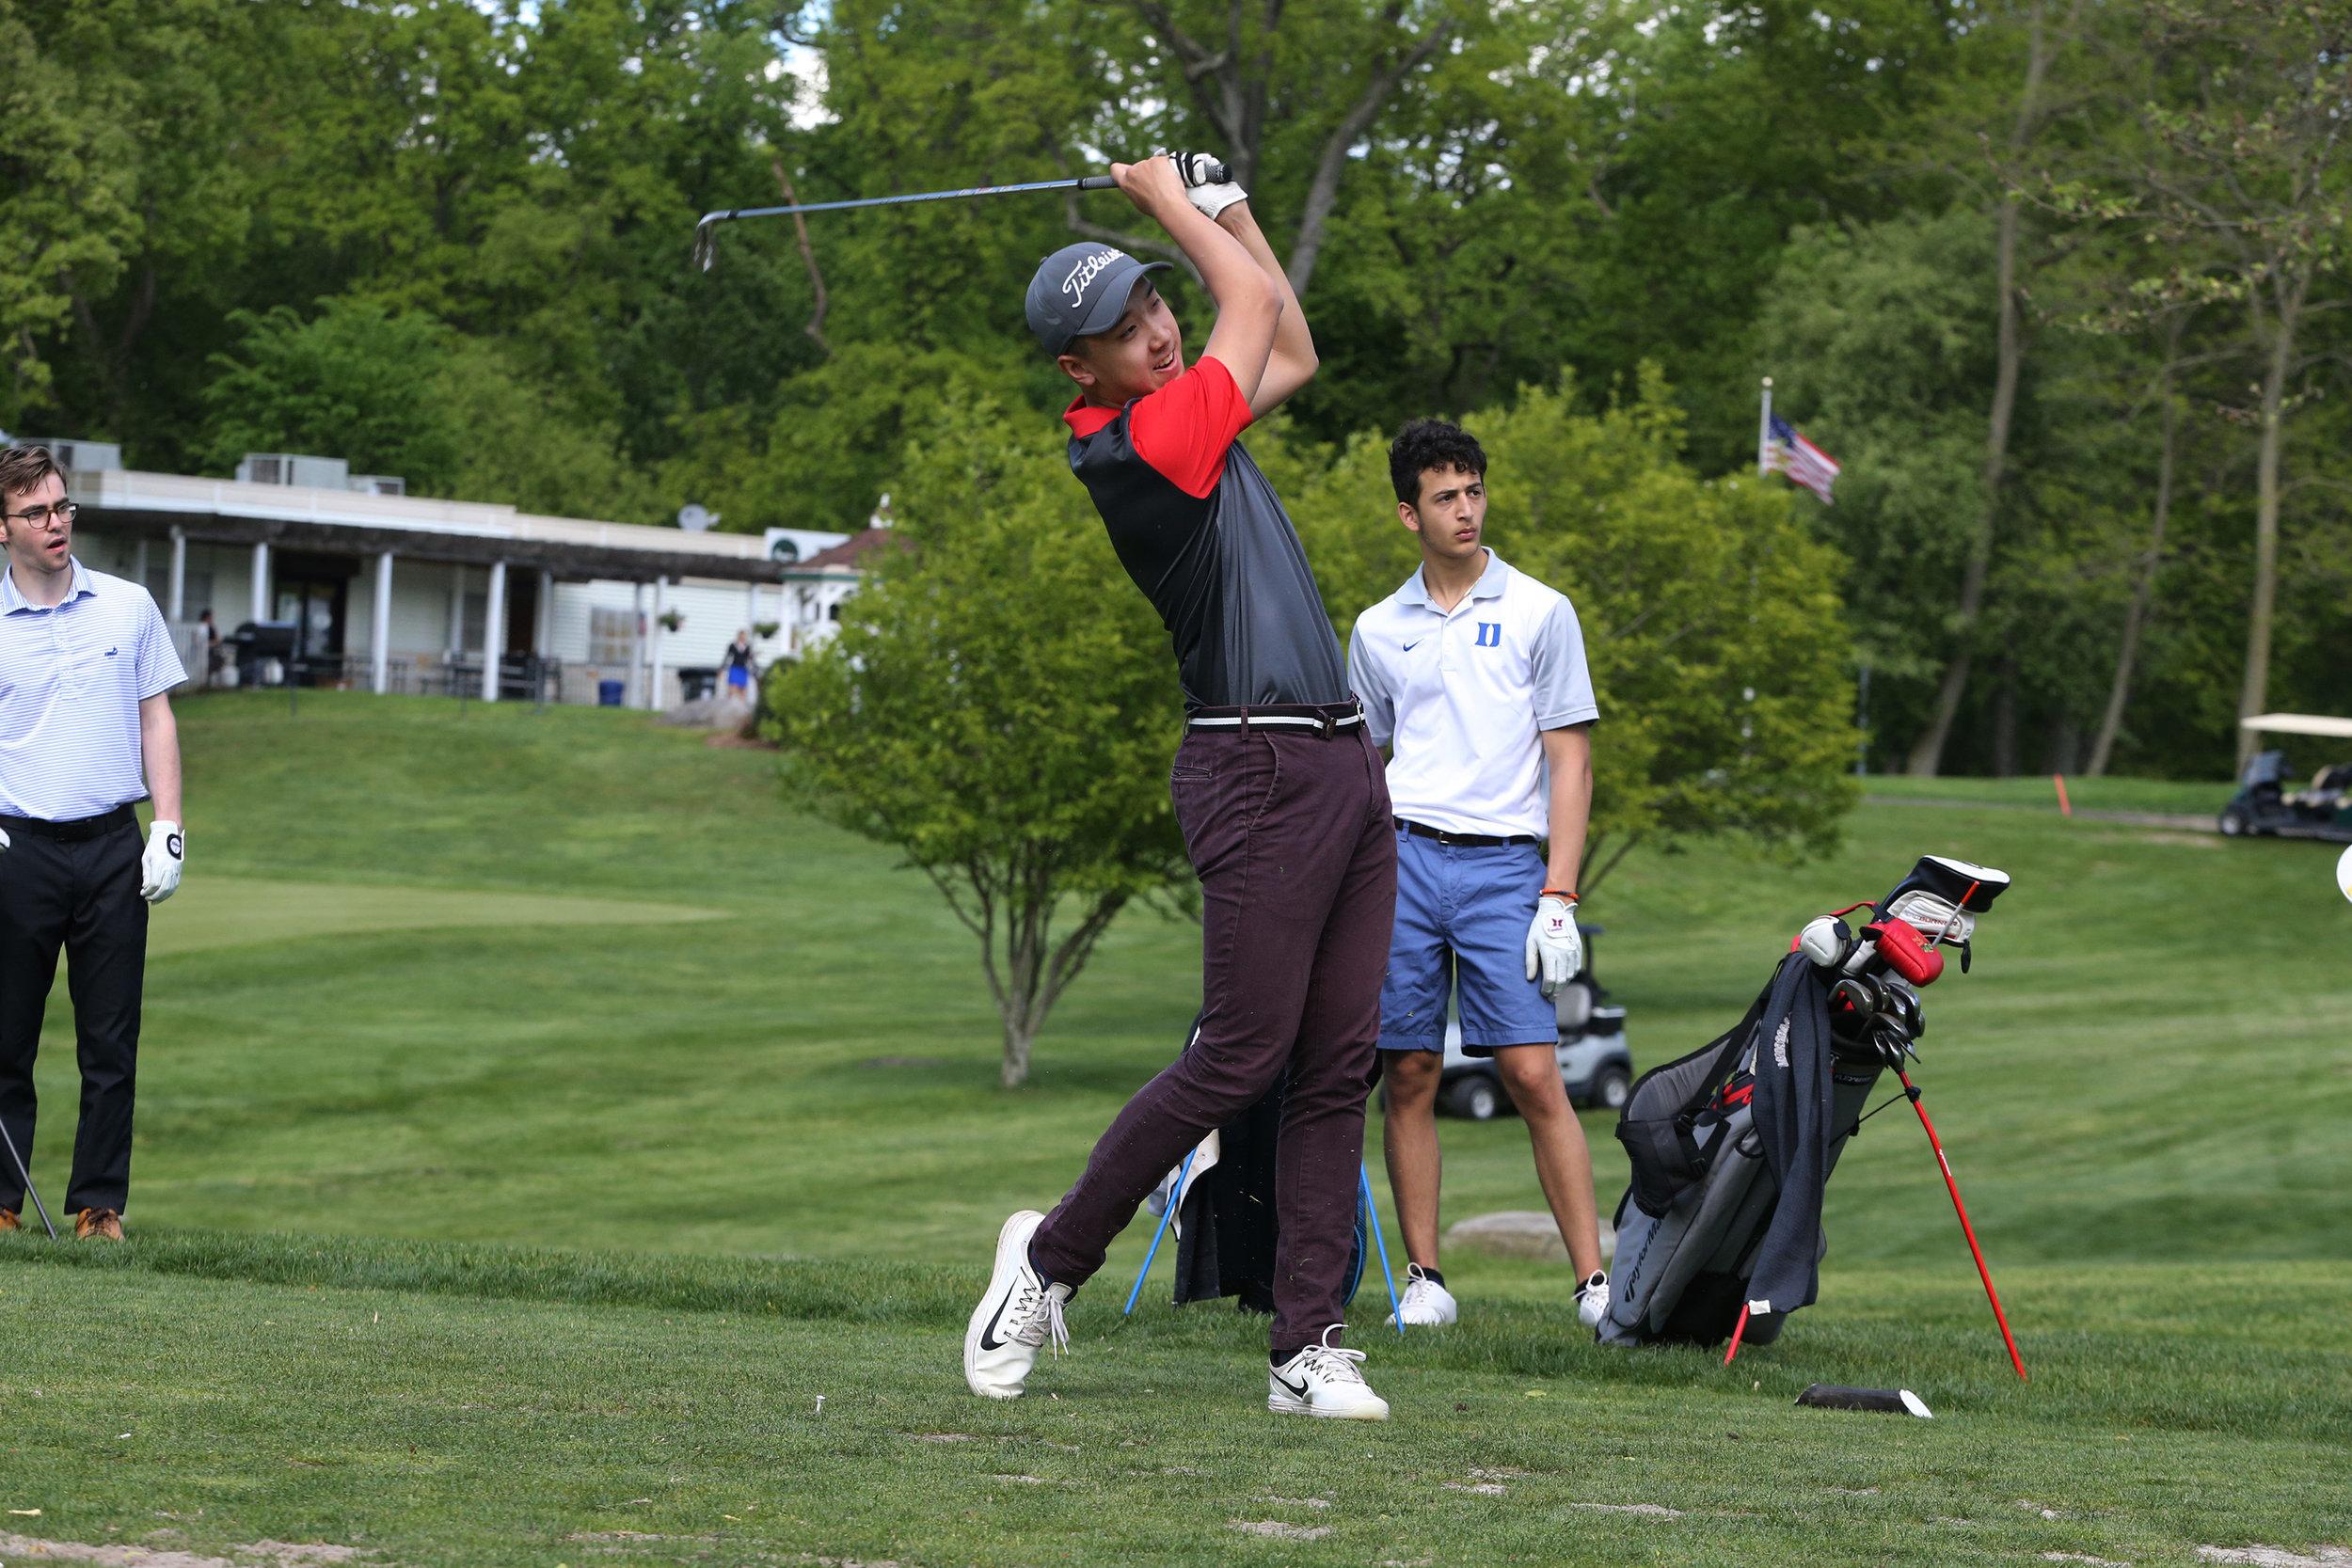 NYCAL Golf Championships 051619-Al Pereira (432).JPG